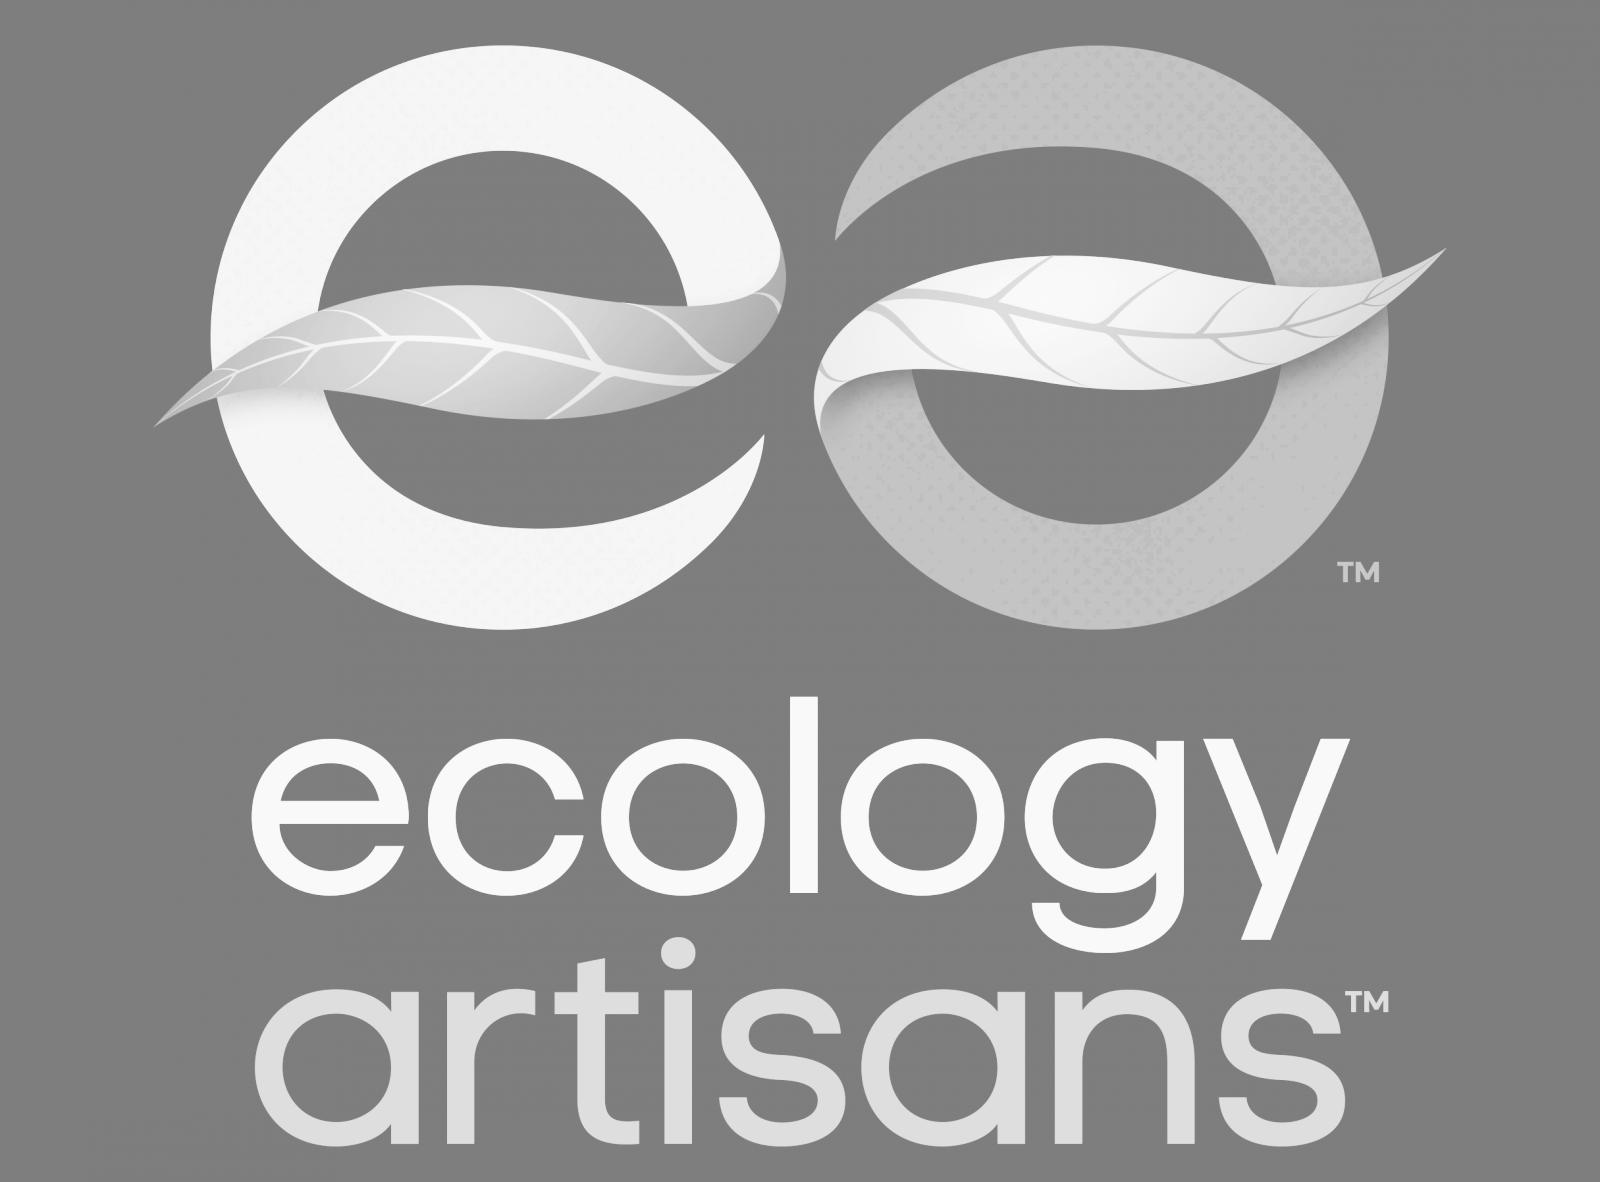 ecology_artisans-logo_square_title-mulberry_bg.png